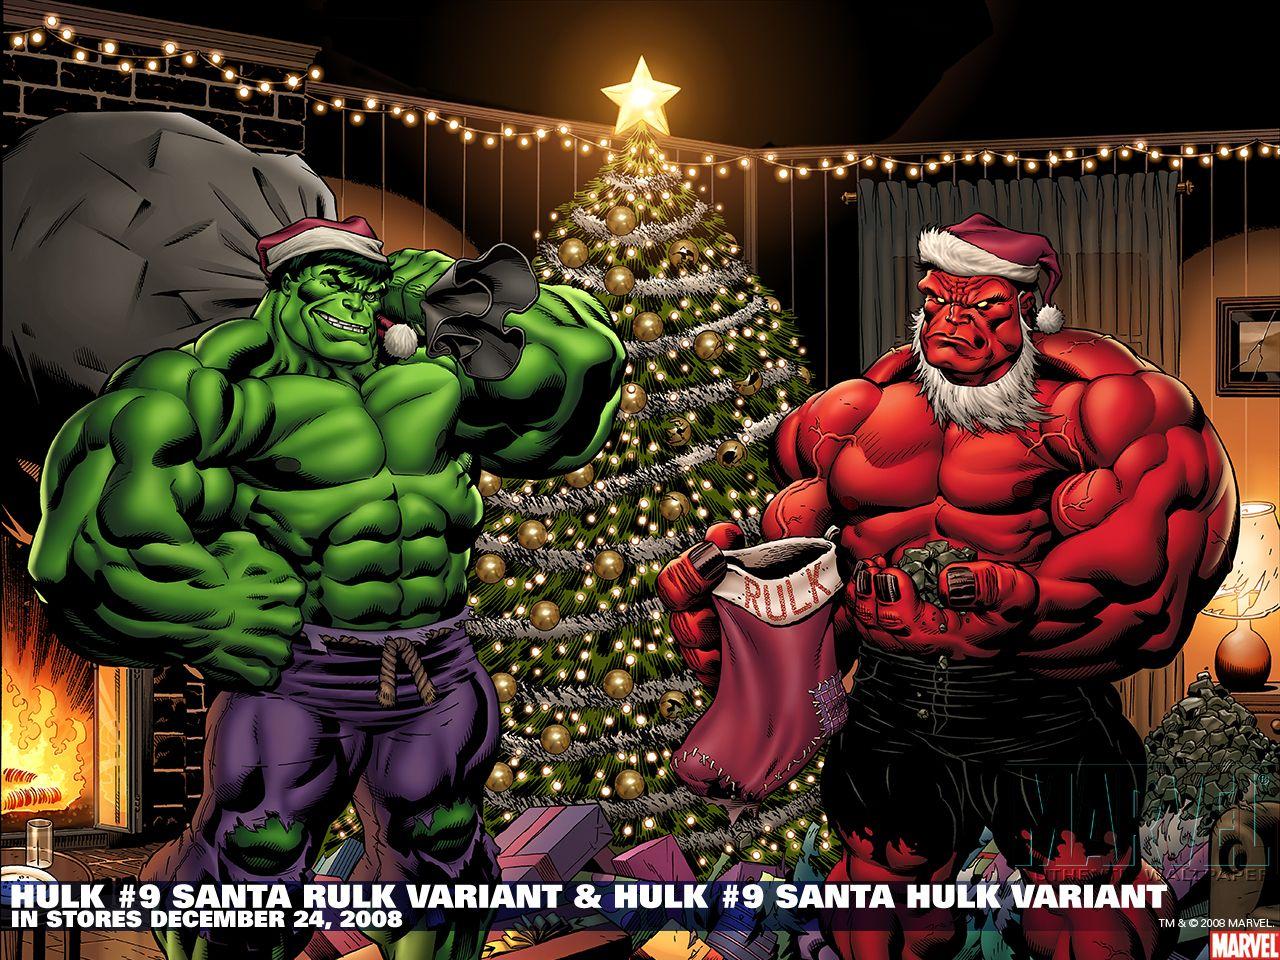 Great Wallpaper Marvel The Incredible Hulk - 73bd96af3526a19f8b4c214f9eada94d  Photograph_59670.jpg